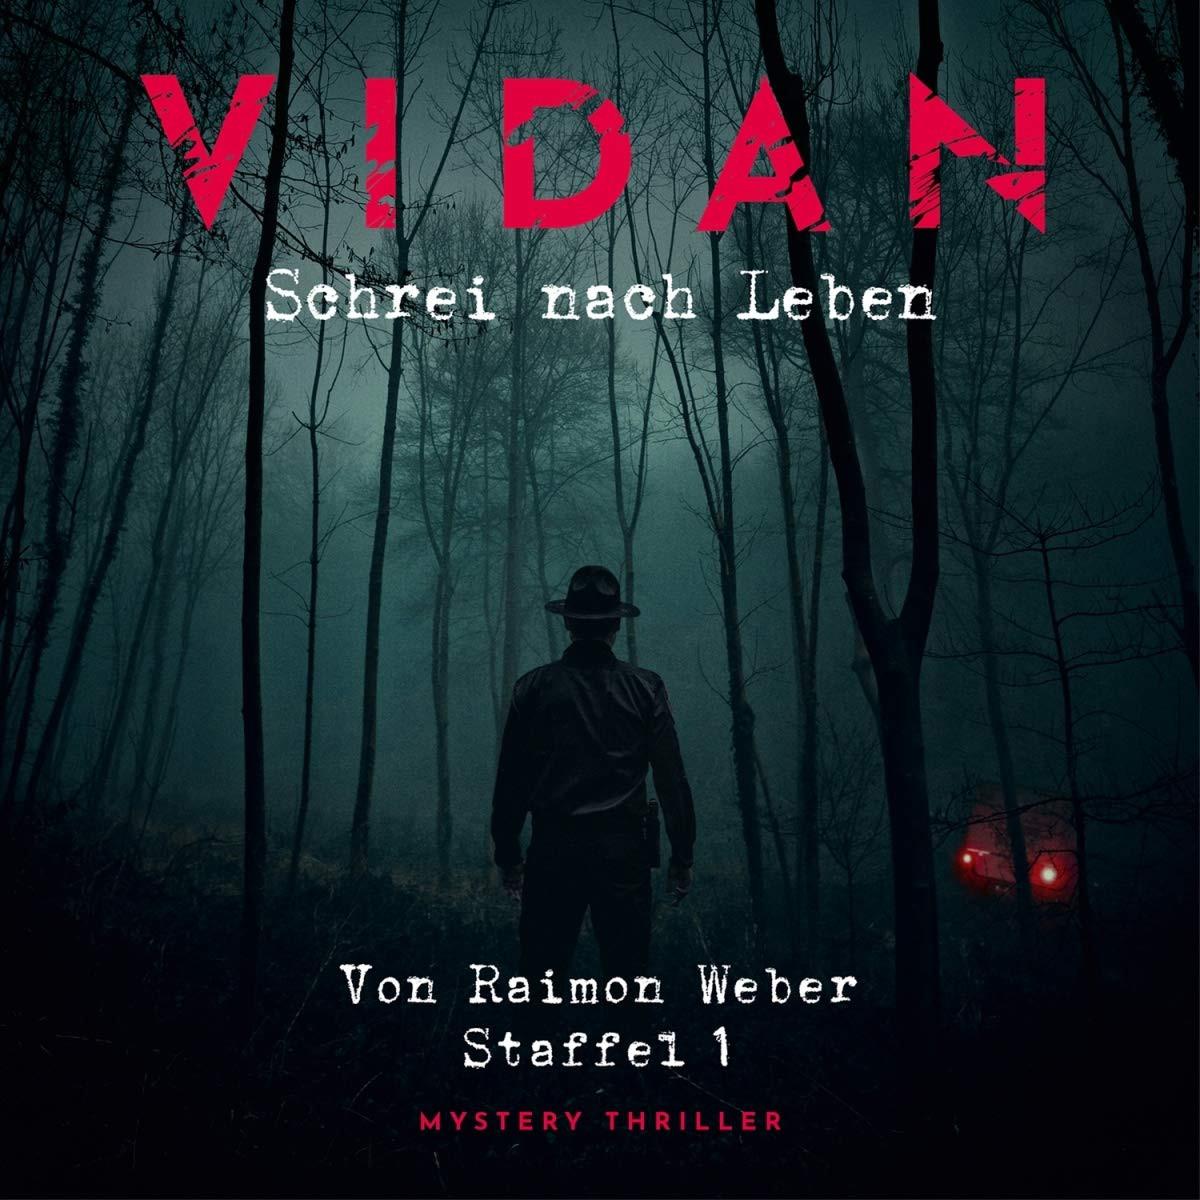 Vidan - Staffel 1: Schrei Nach Leben